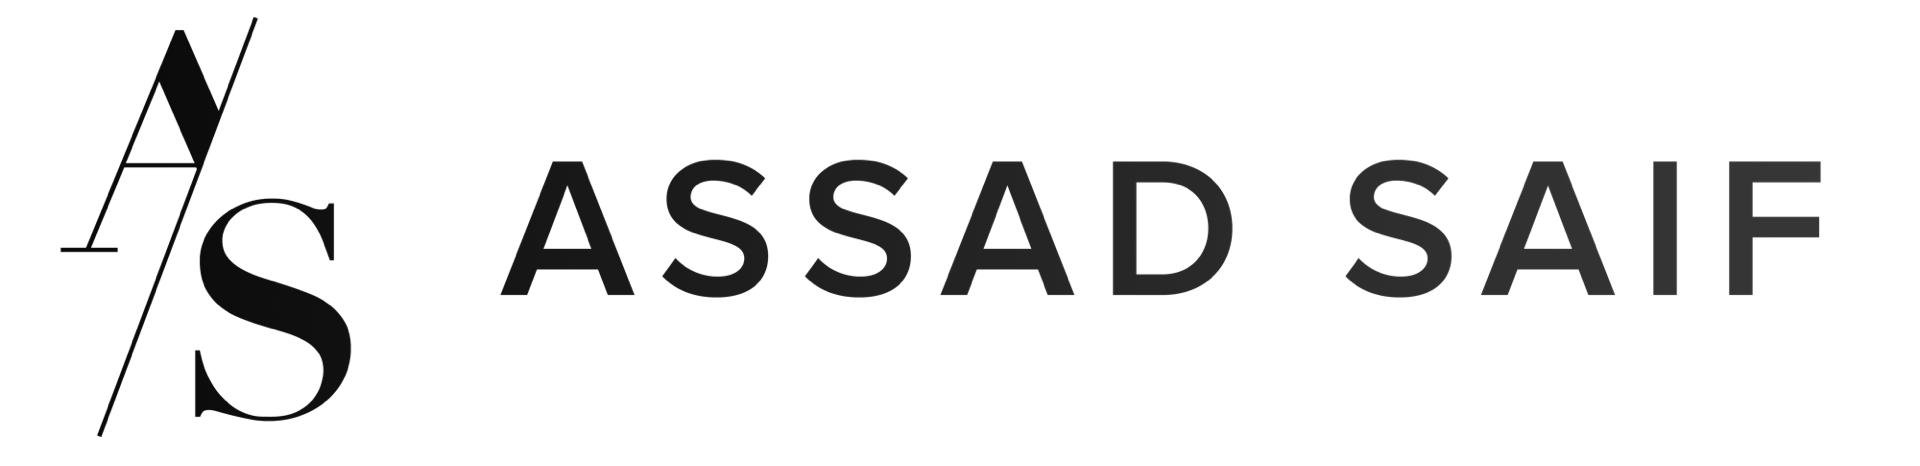 Assad Saif